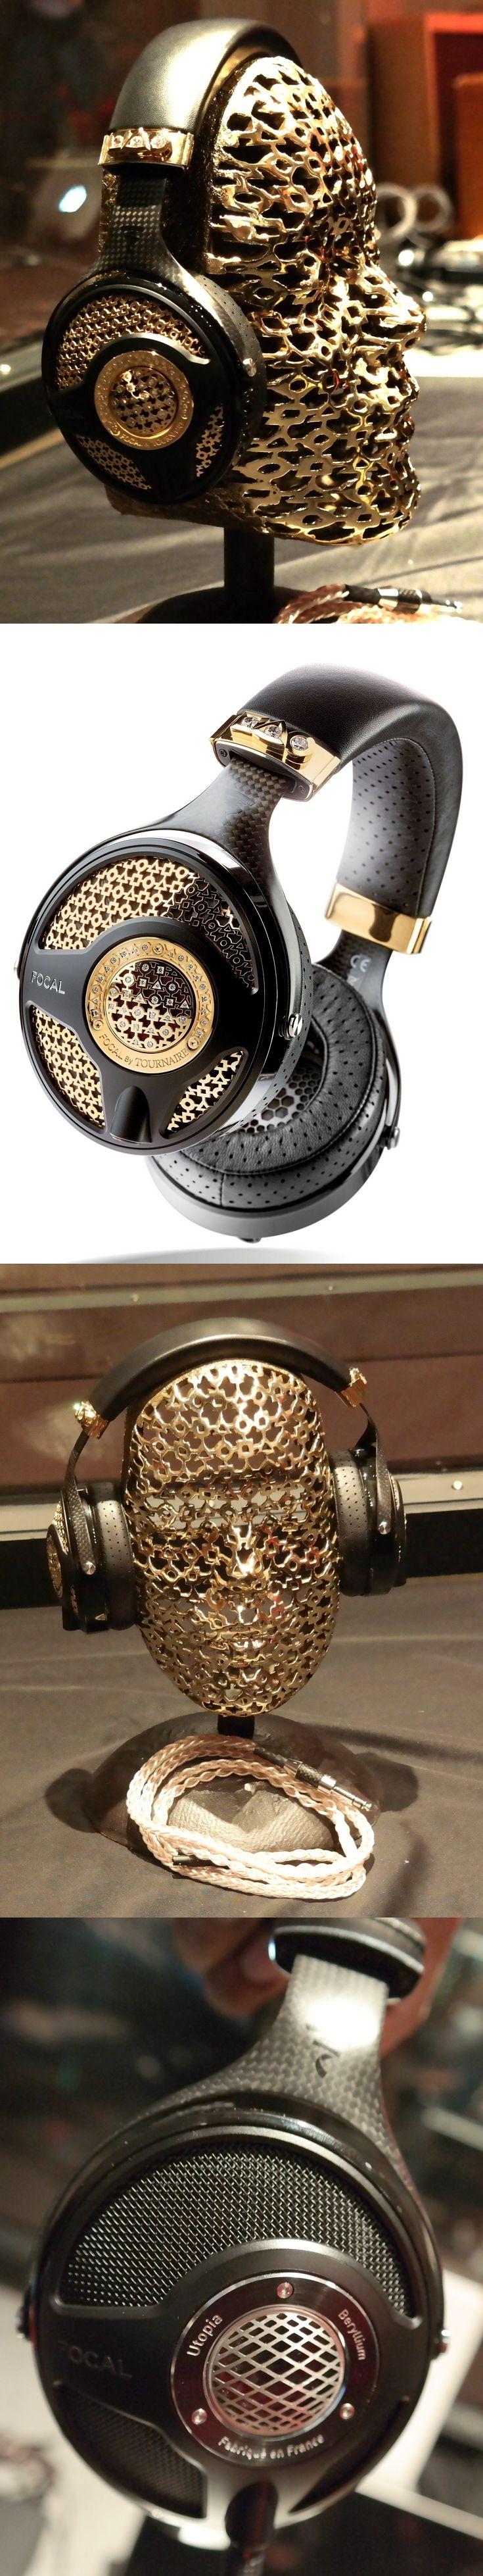 What do 120,000 headphones sound like? Pretty darn good